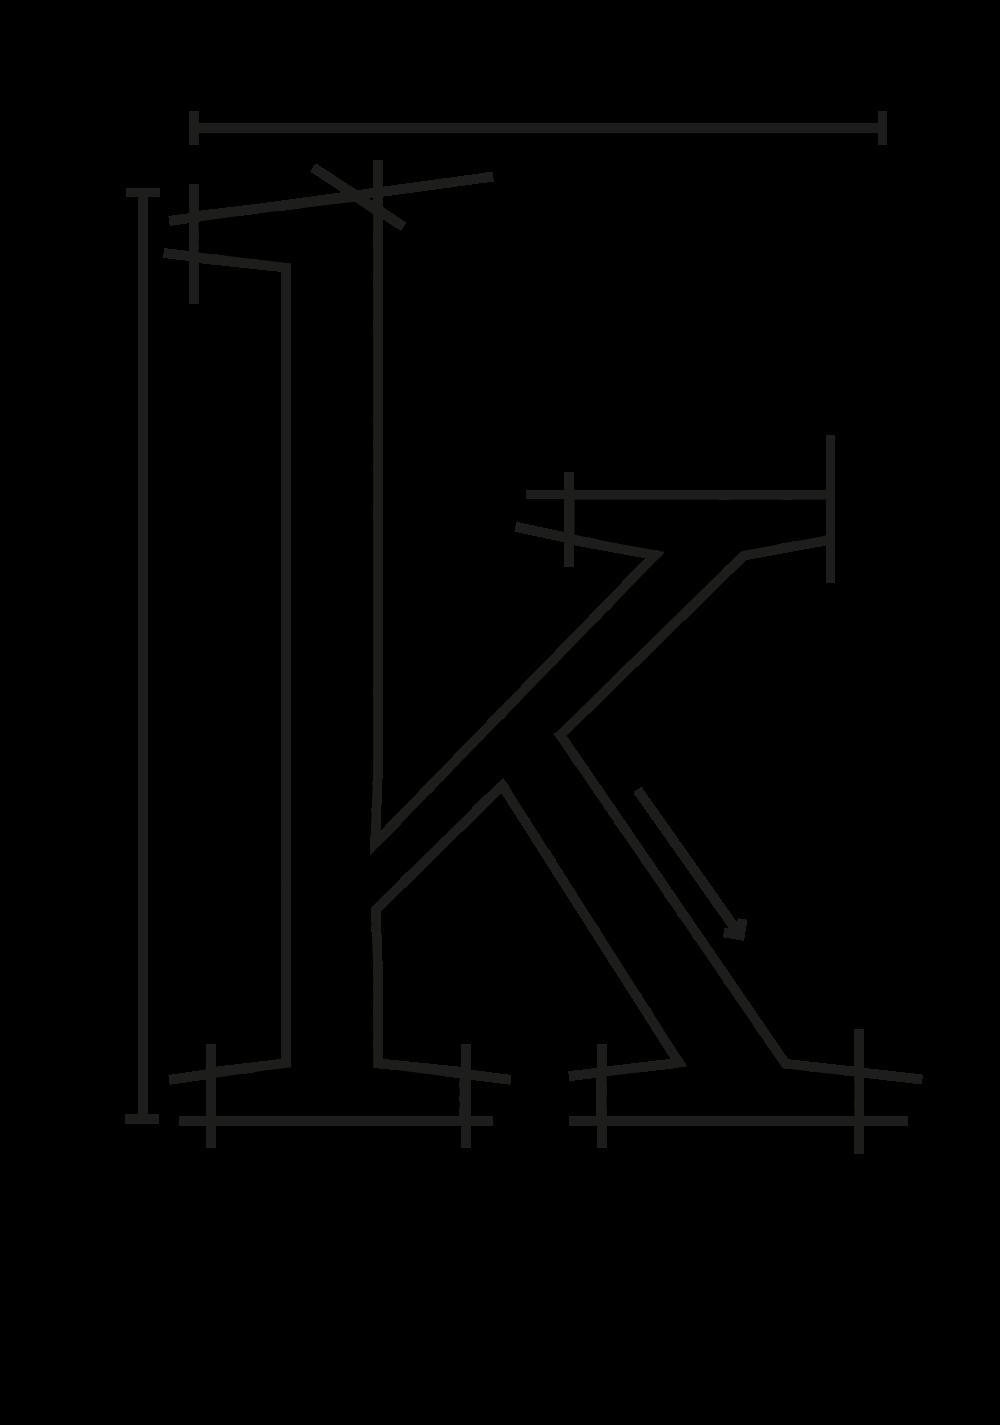 kyllerphoto-symbol-rev2-svart